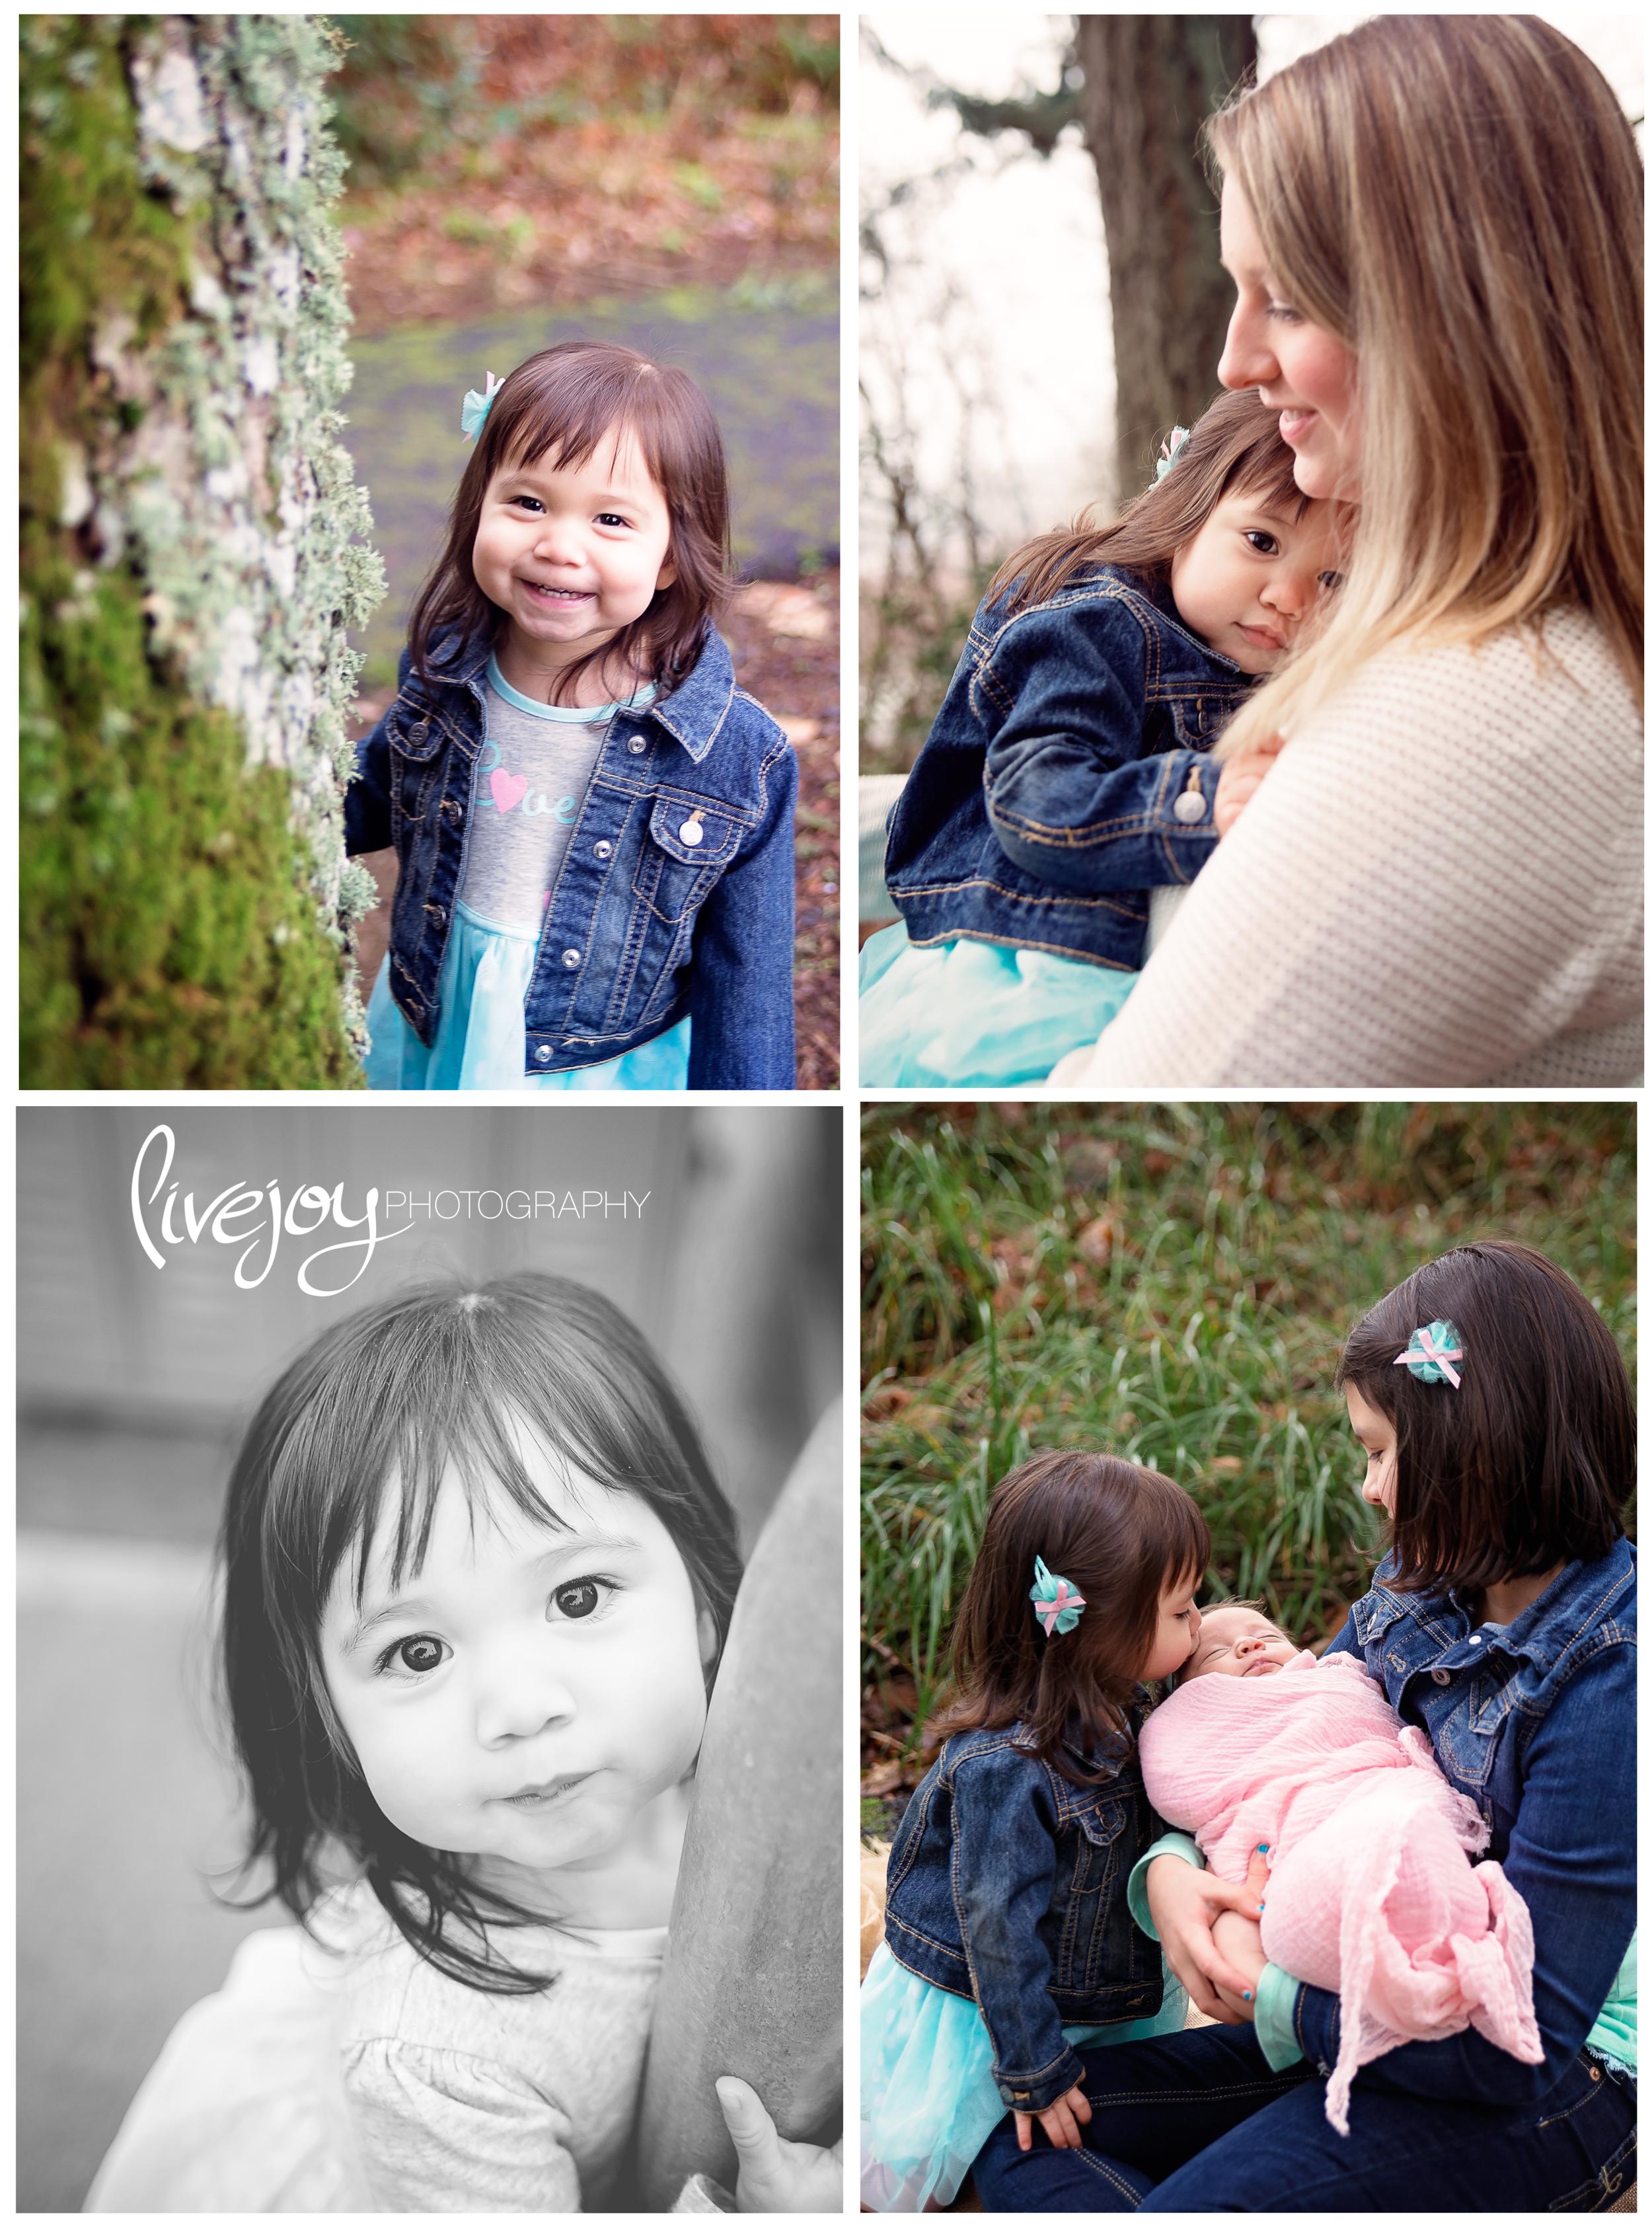 18 Months Outdoor Baby Photos | Oregon | LiveJoy Photography